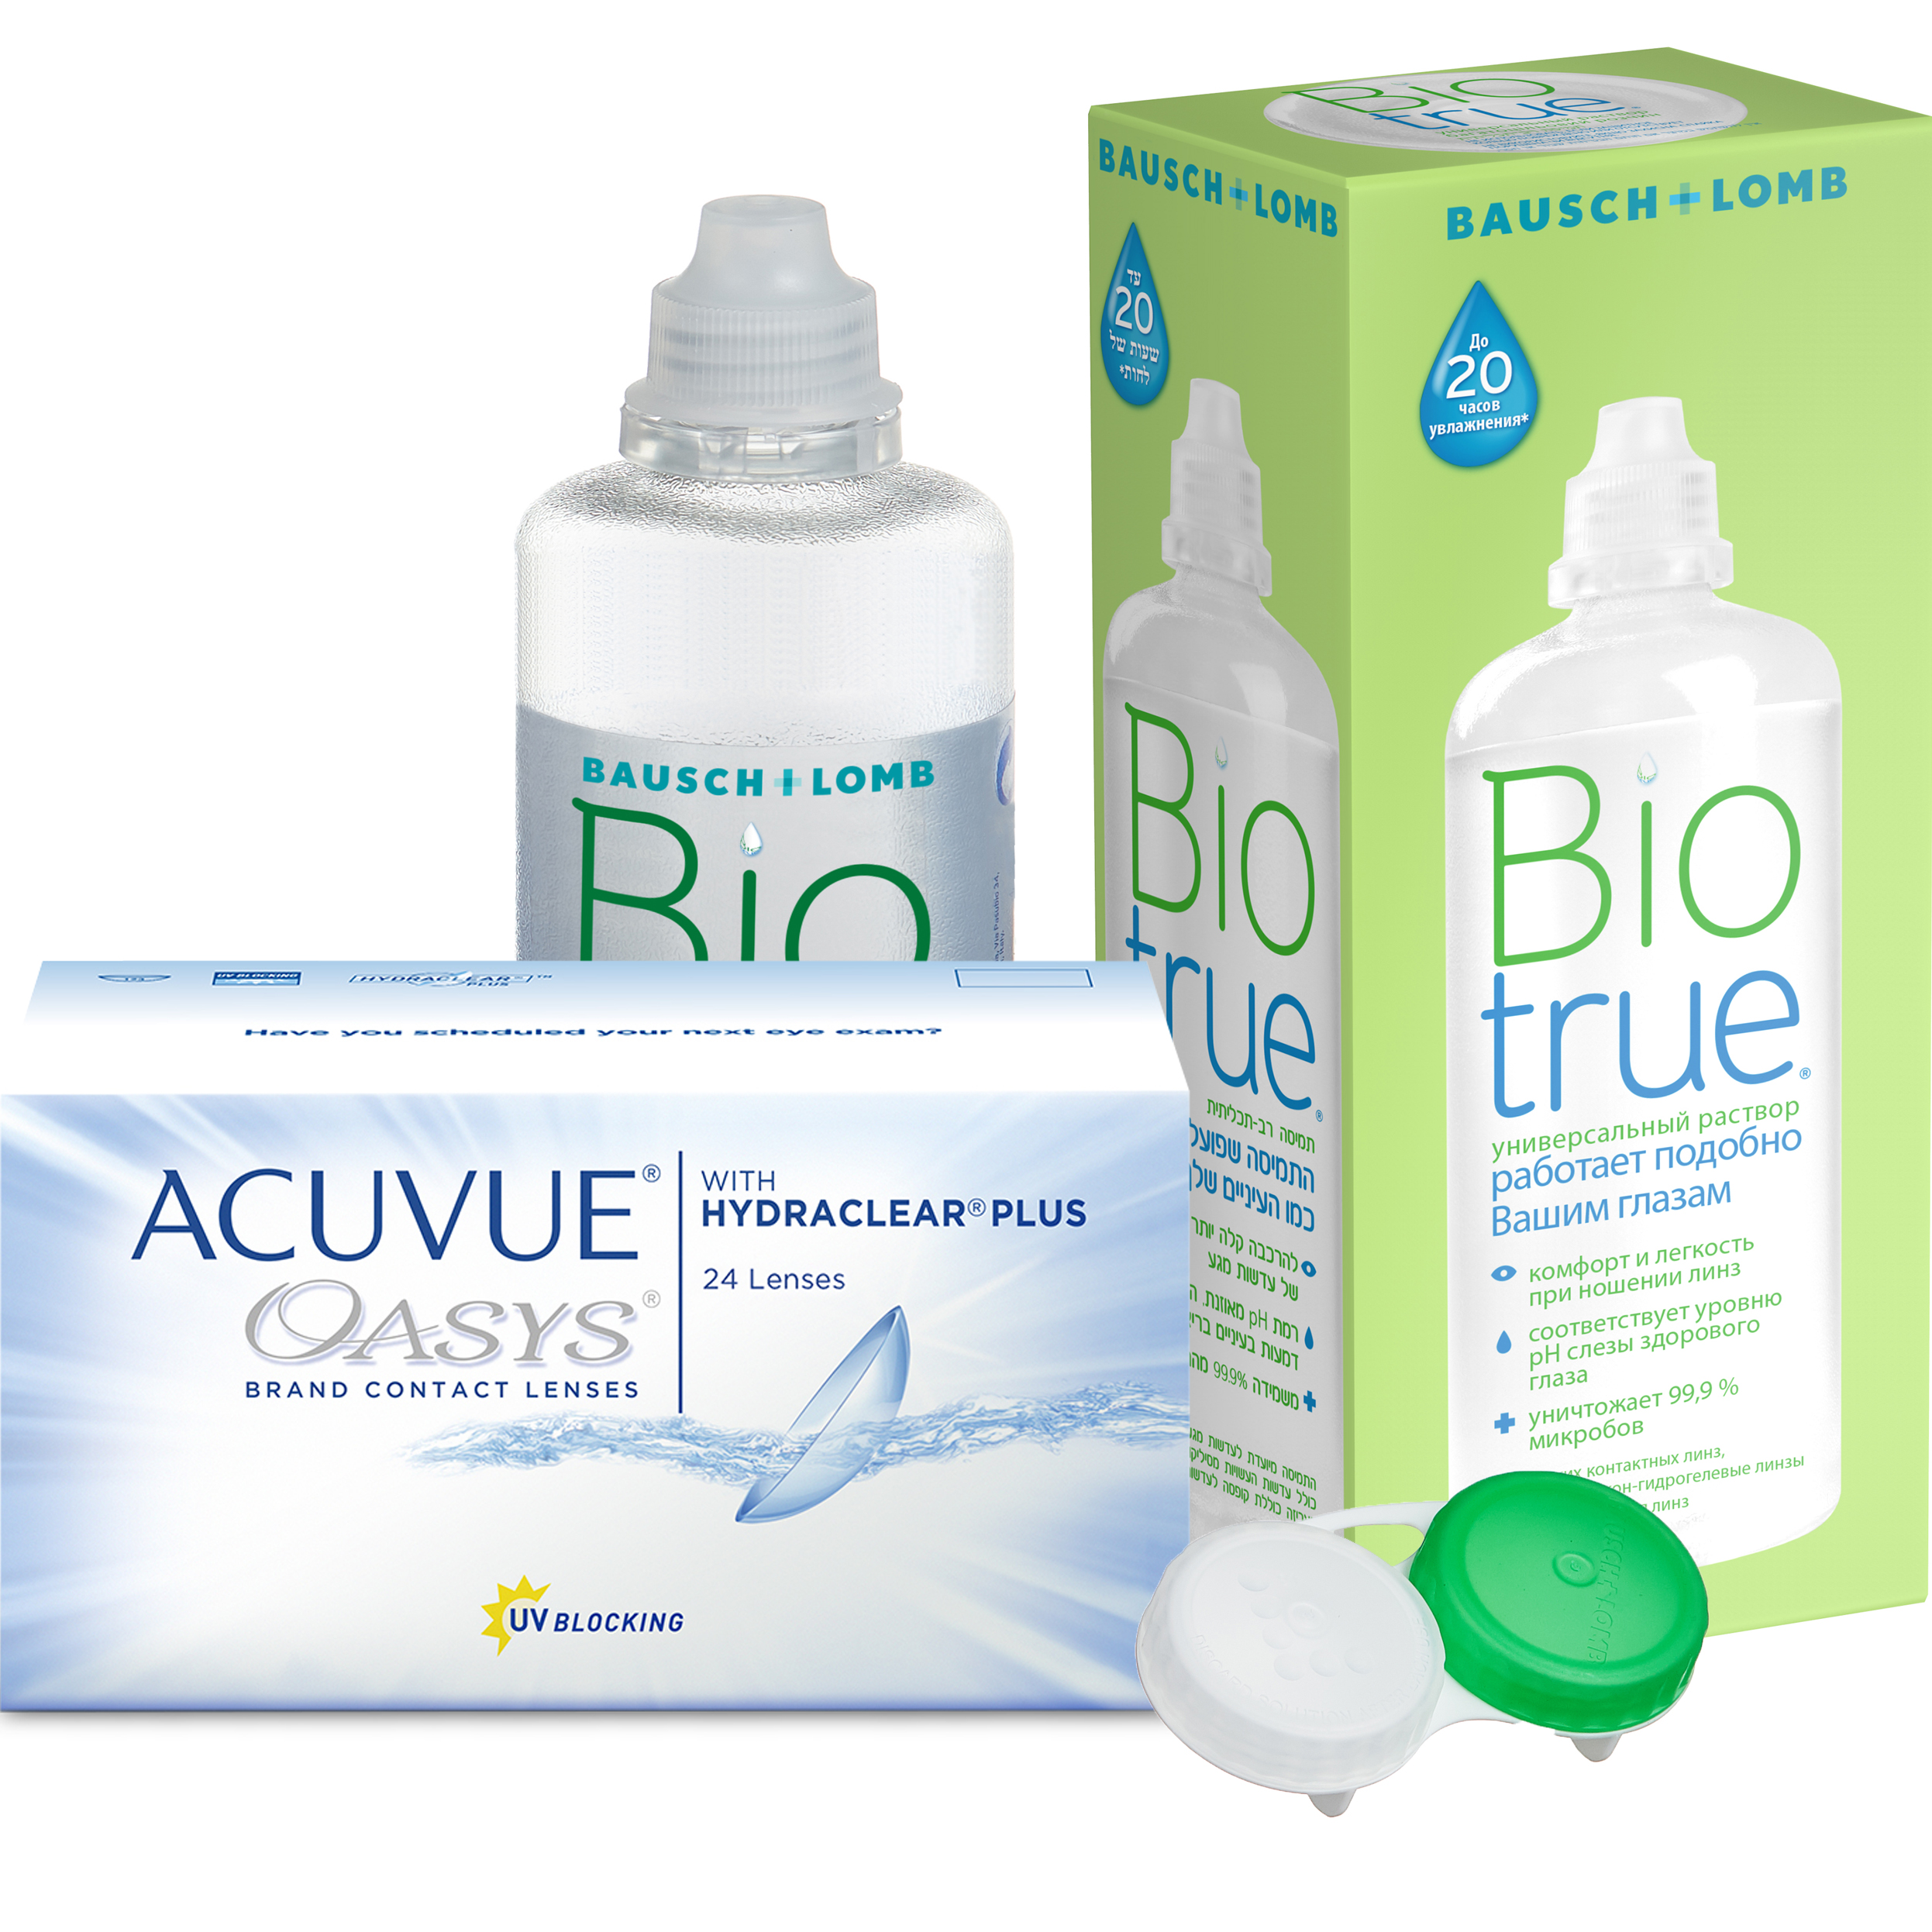 Купить Oasys with Hydraclear Plus 24 линзы + Biotrue, Контактные линзы Acuvue Oasys with Hydraclear Plus 24 линзы R 8.8 -3, 75 + Biotrue 300 мл